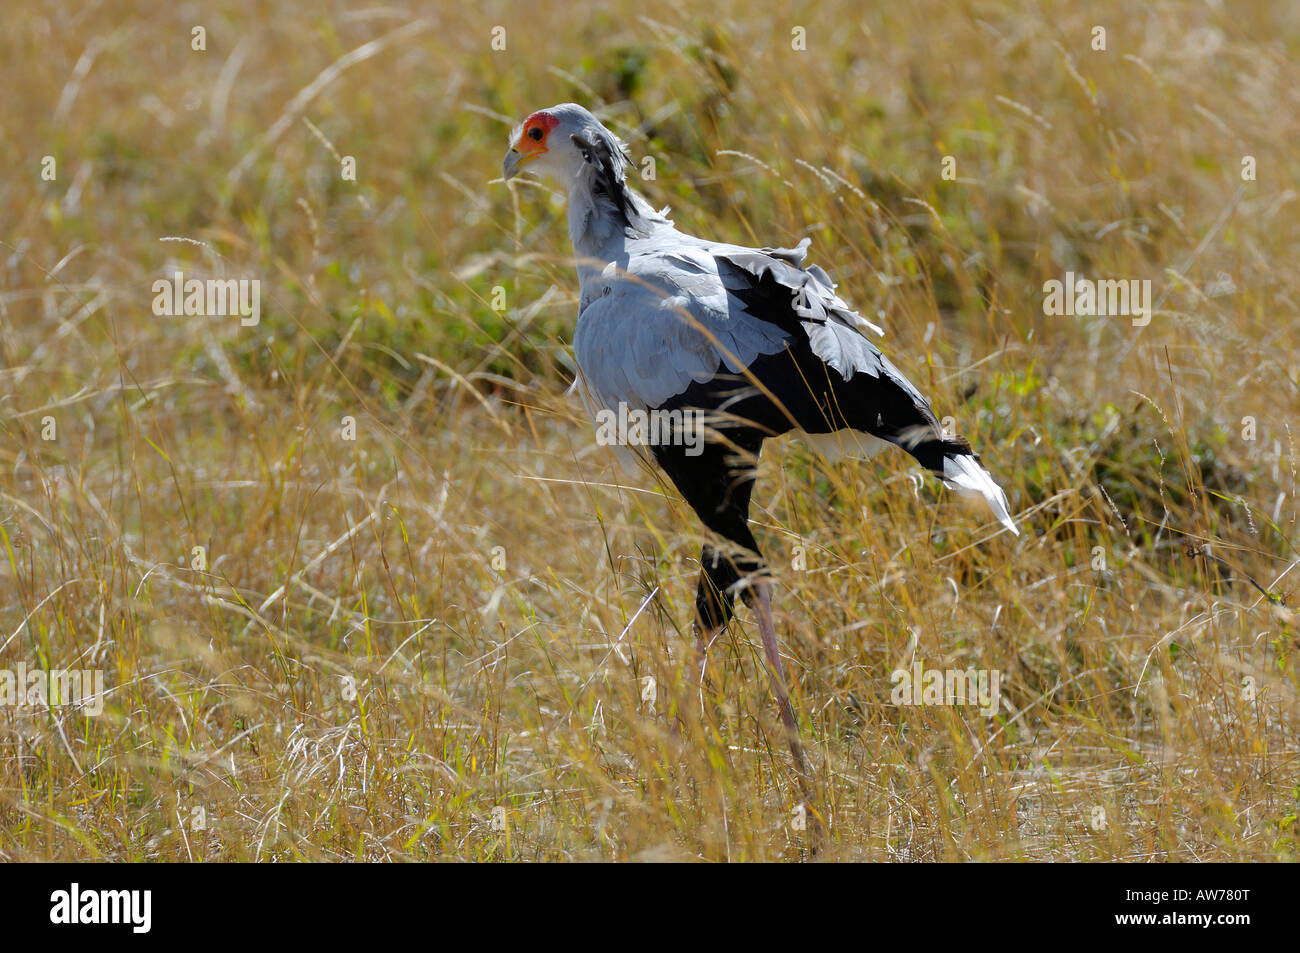 Secretary bird, Masai Mara, Kenya Stock Photo